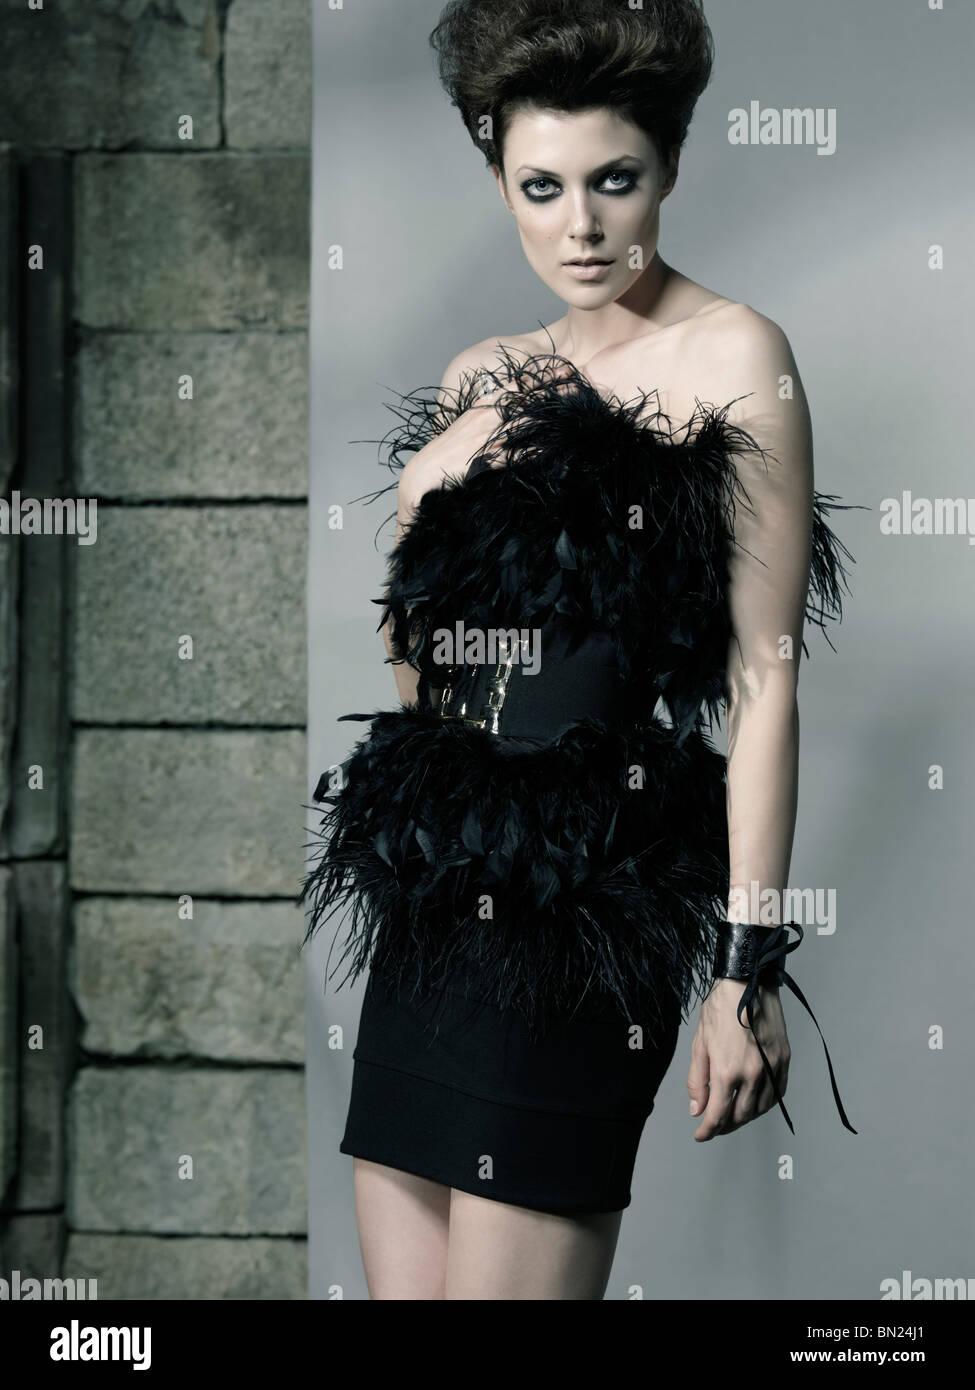 High fashion photo of a beautiful woman wearing elegant black feathery dress - Stock Image